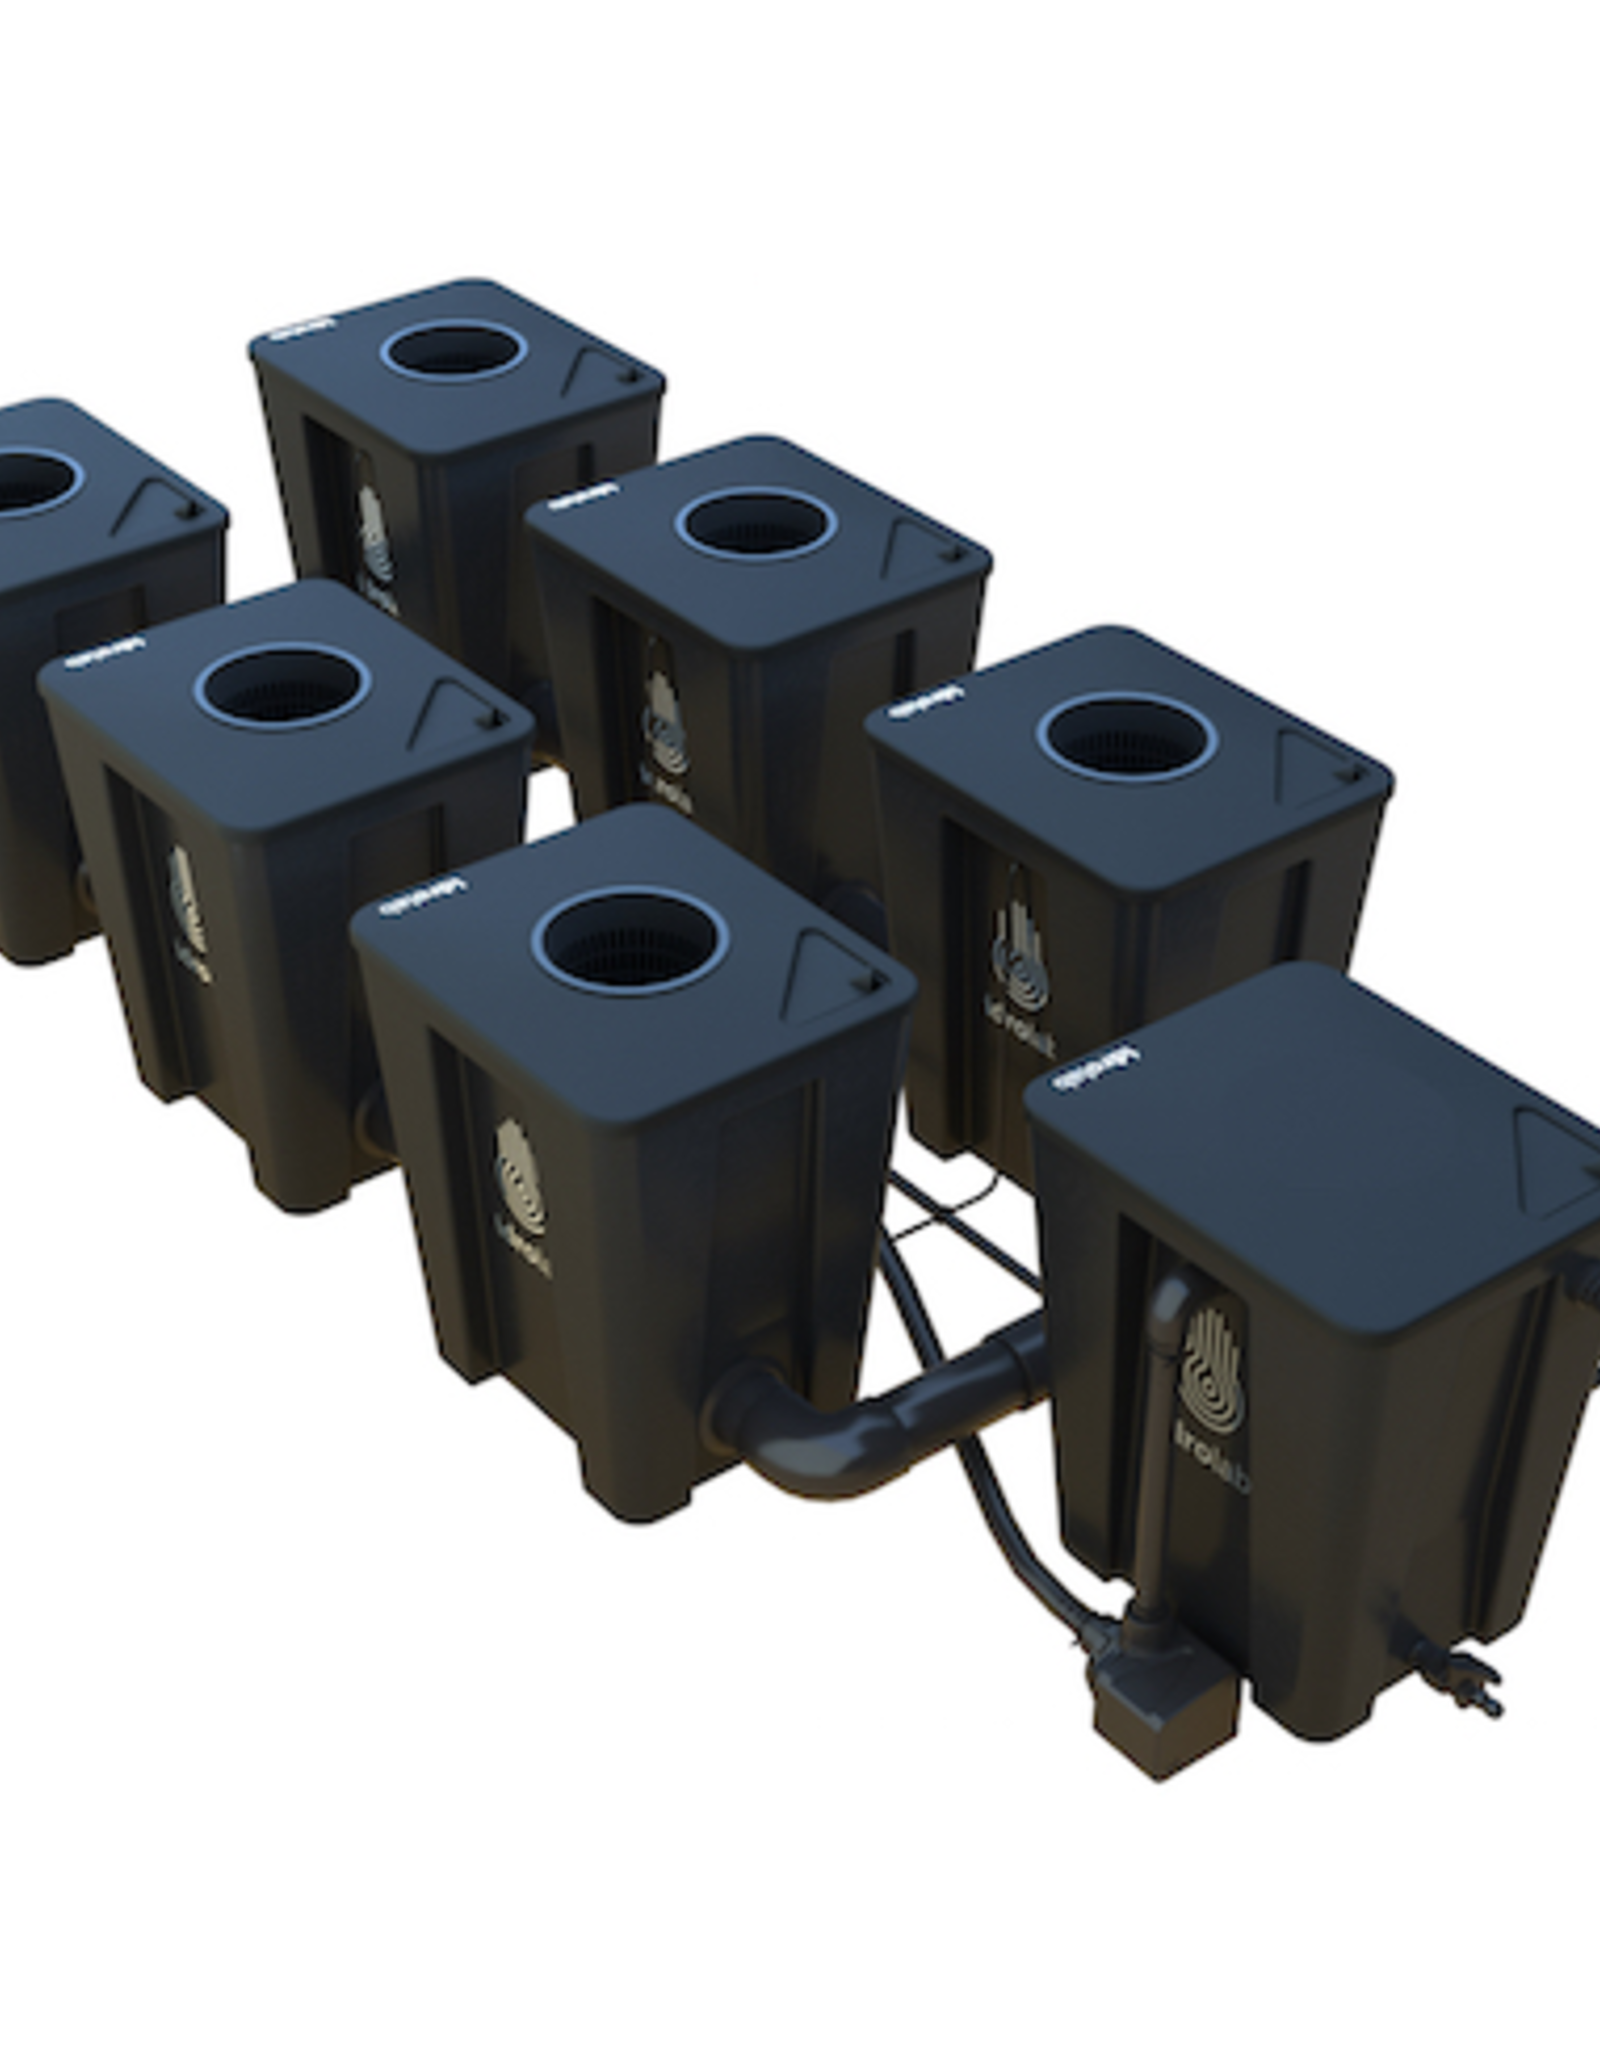 IDROLAB IDROLAB RDWC SYSTEM 2 ORIGINAL 6+1